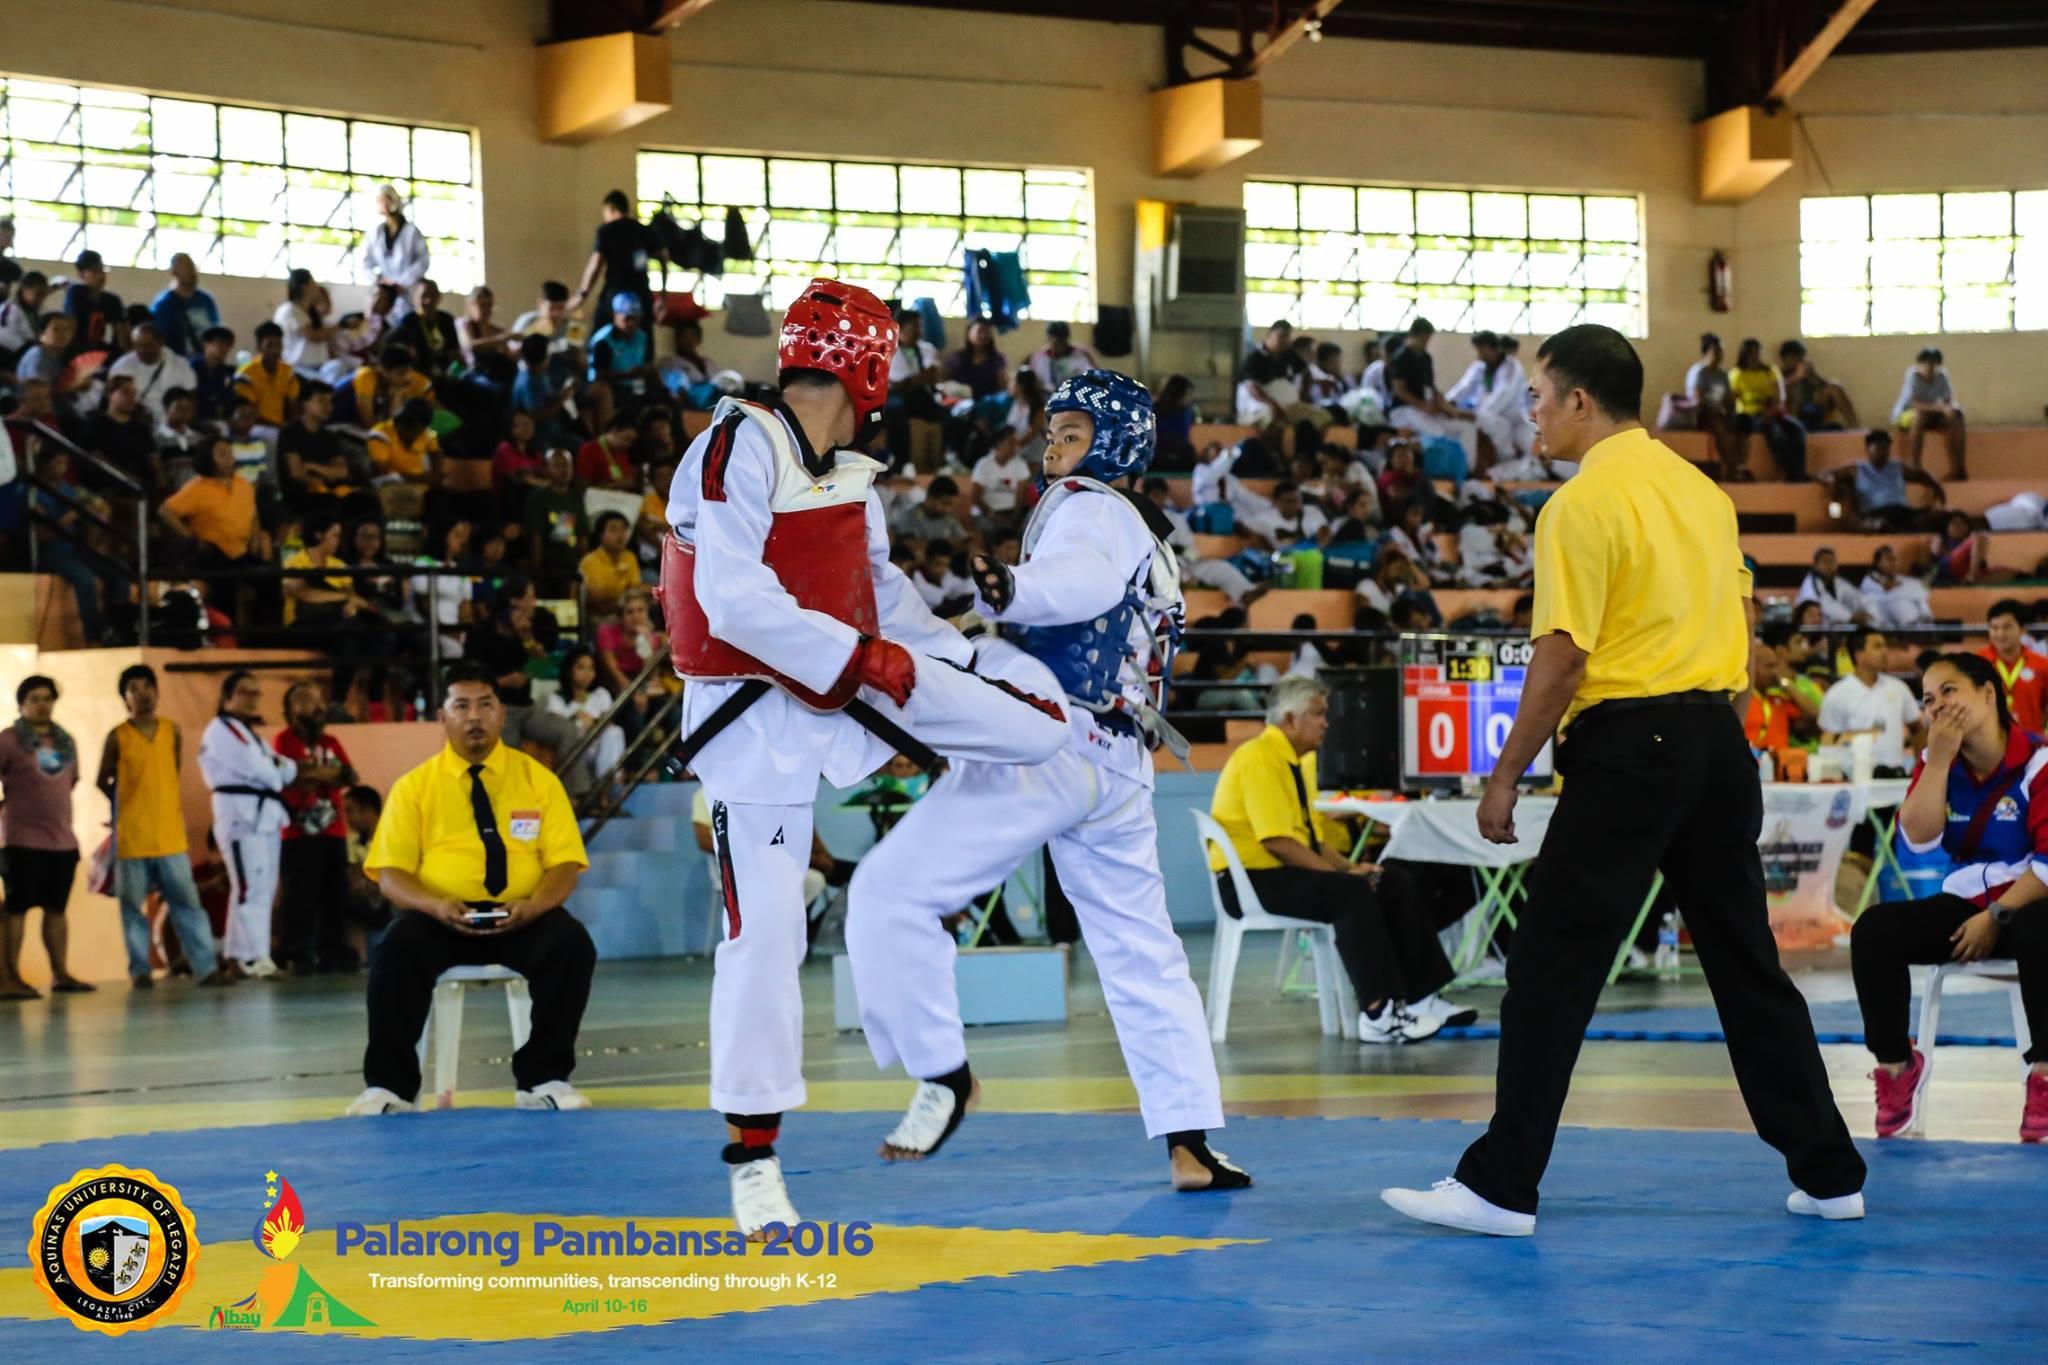 Palarong Pambansa 2016: Taekwondo and Chess